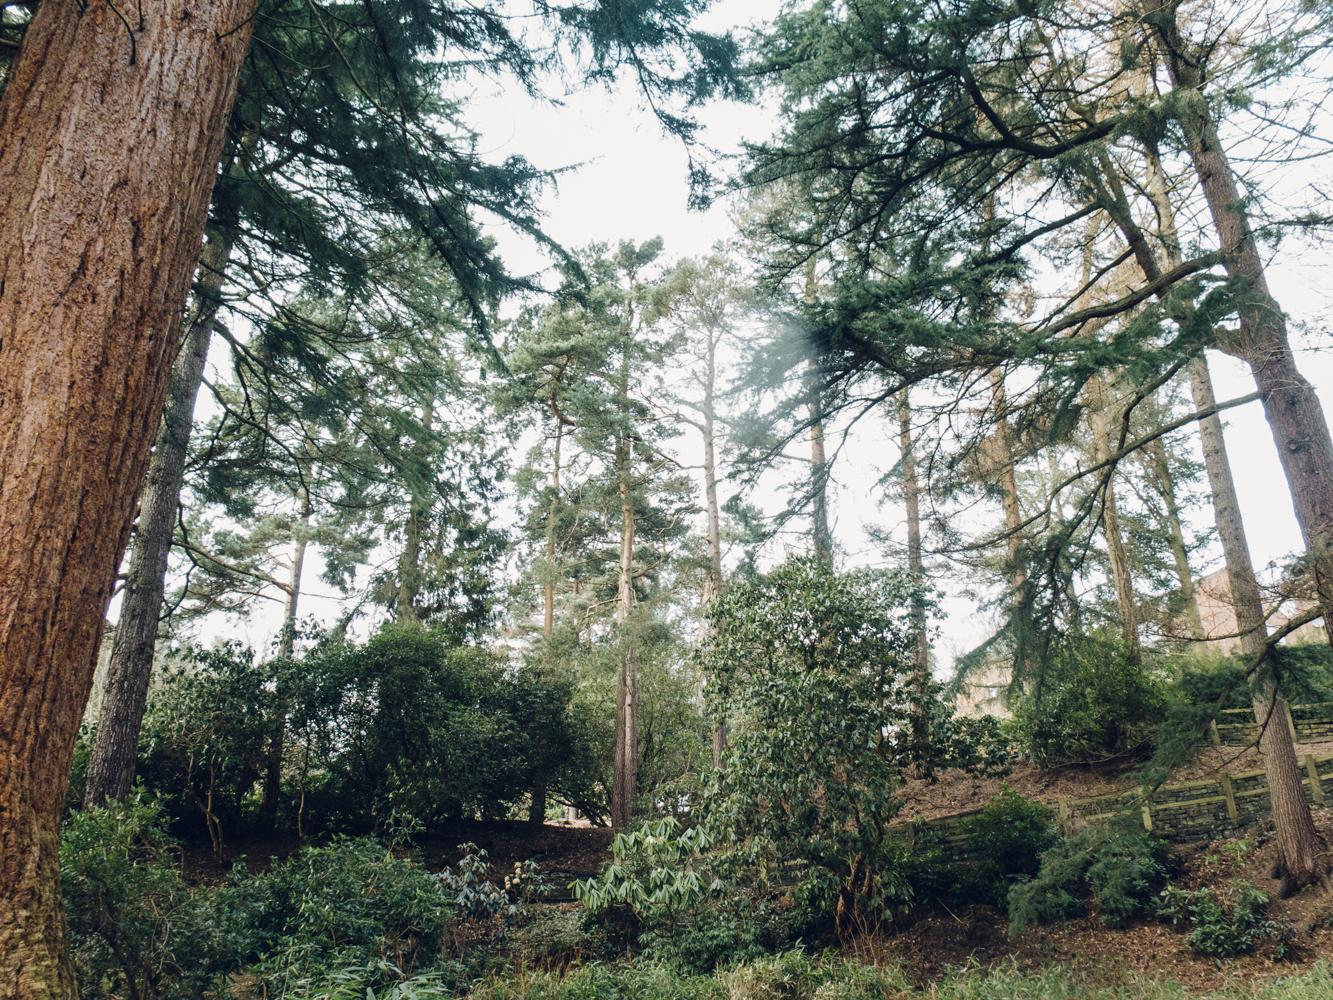 Haarkon Whinfell Quarry Gardens Sheffield Rhodedendron Travel Nature Park Redwood Sequoia